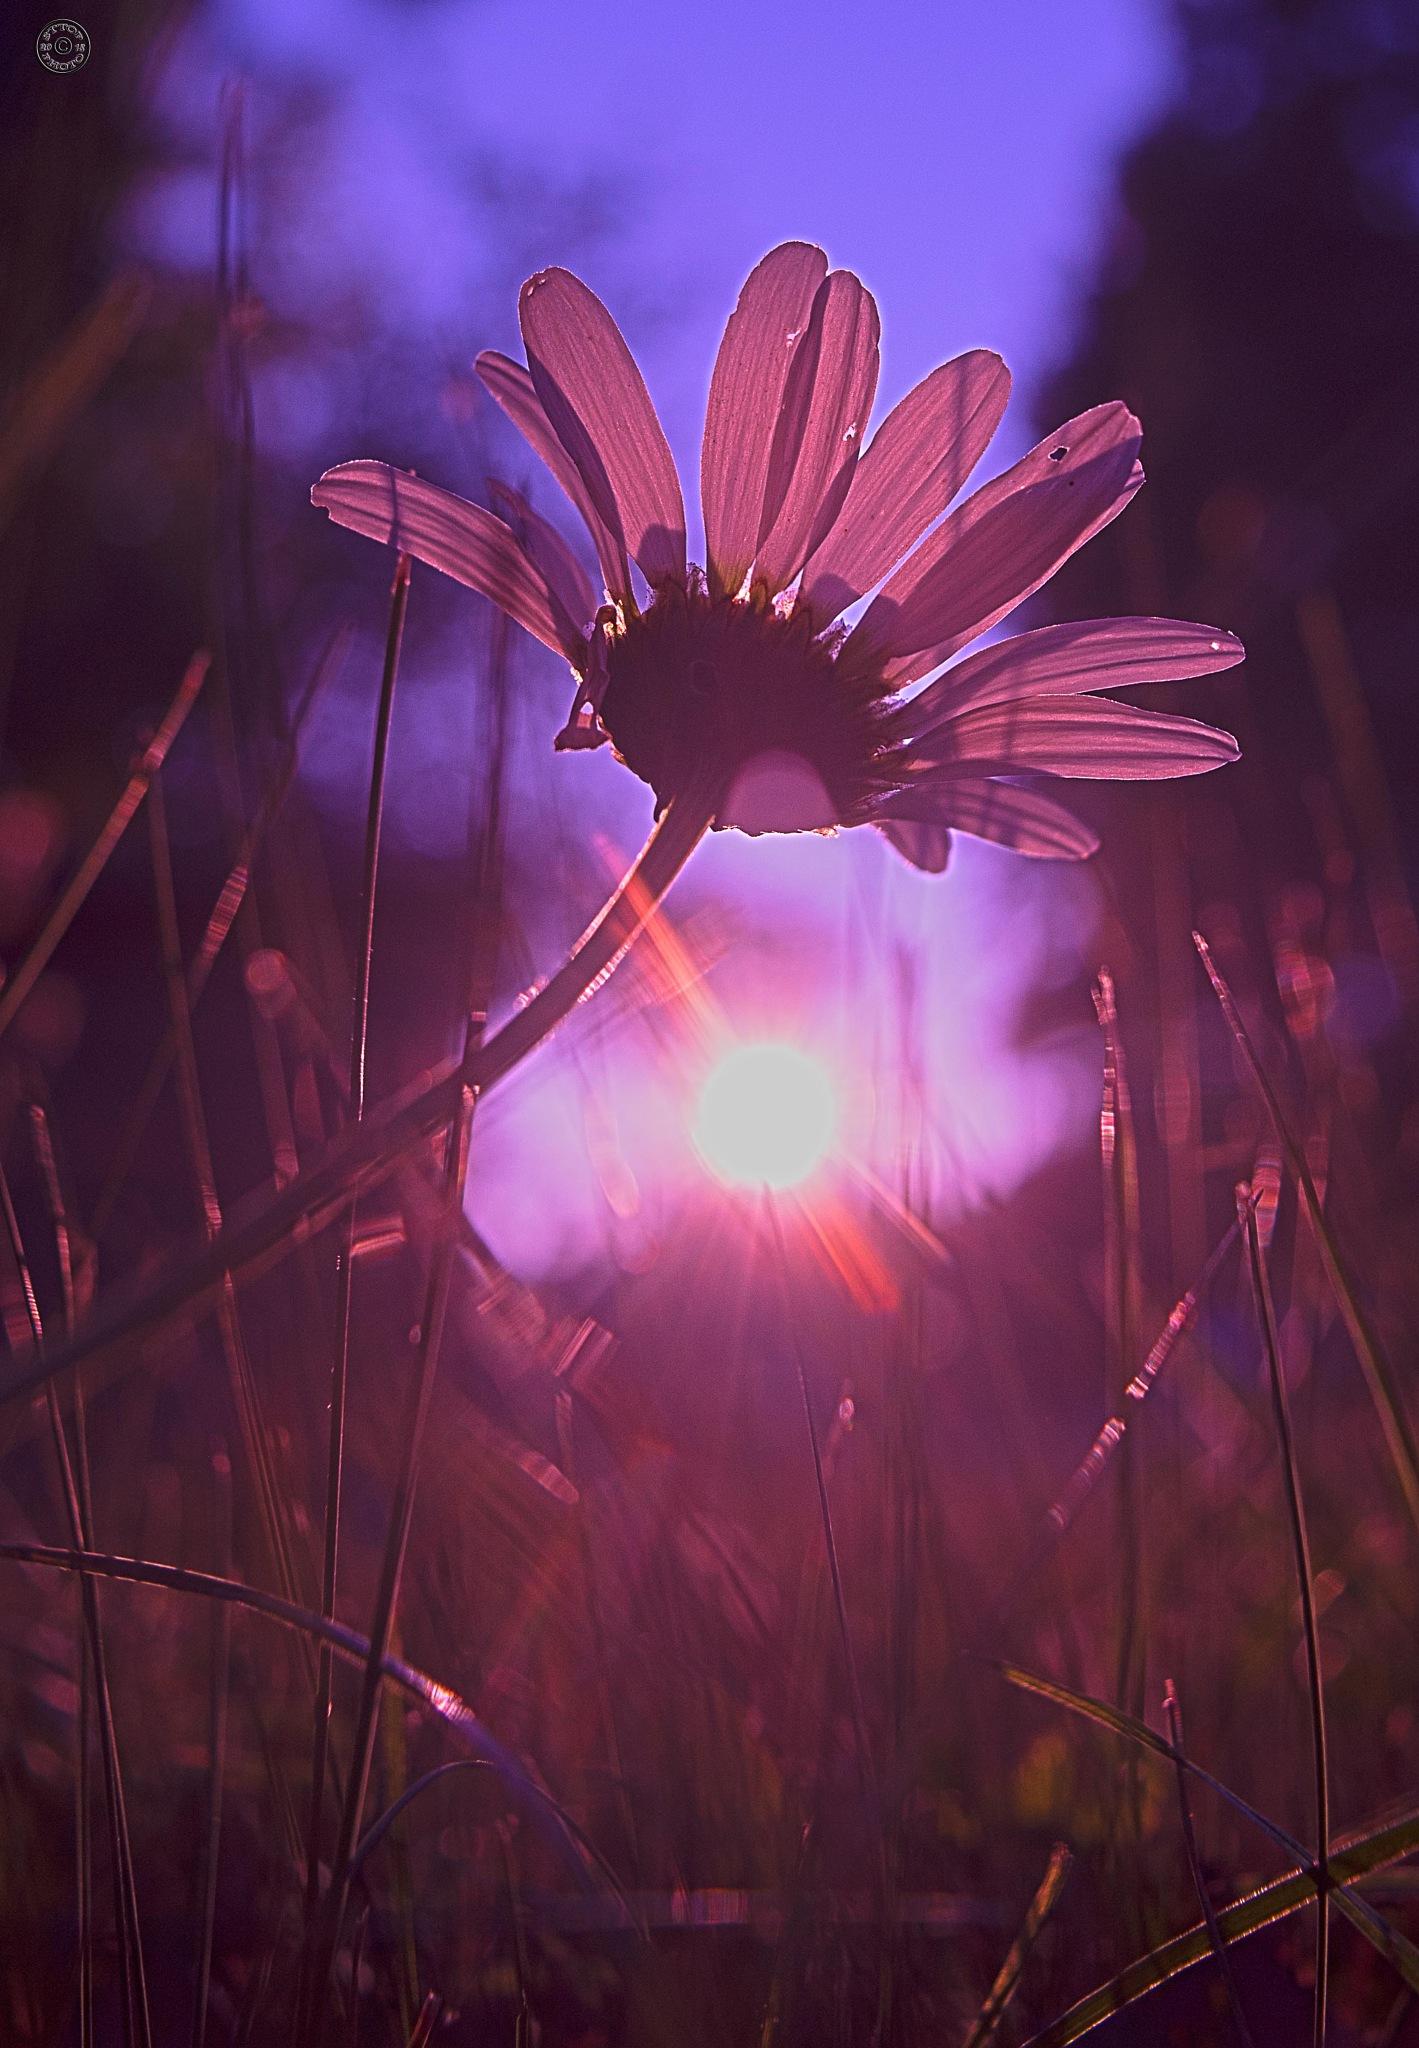 sunset by Belgerathone